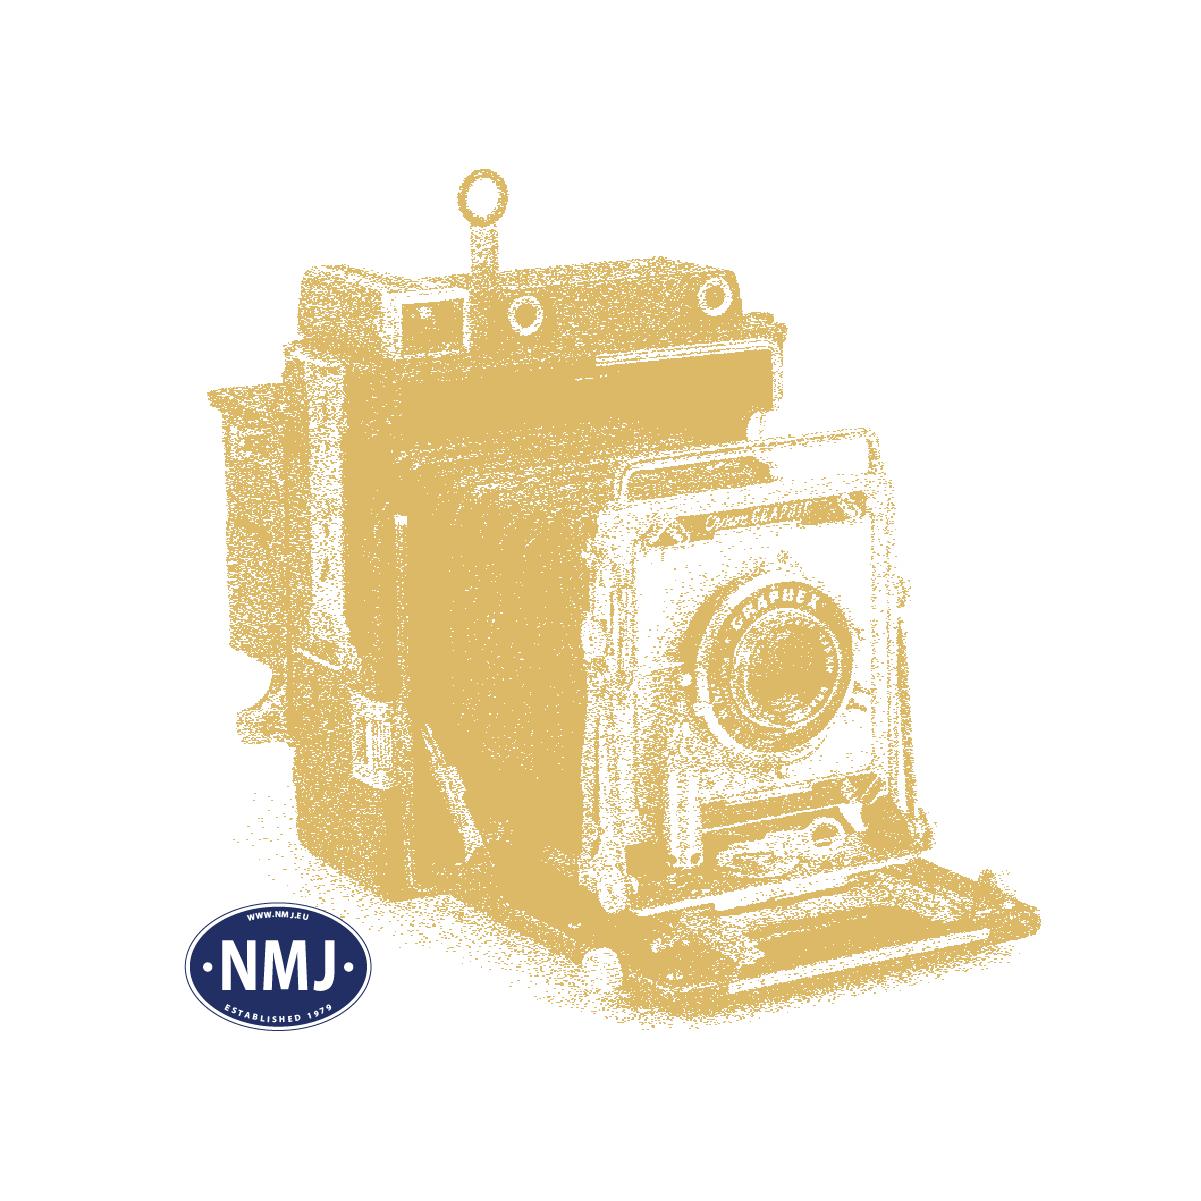 NMJT90504 - NMJ Topline TÅGAB TMY 102, DCC m/ Lyd